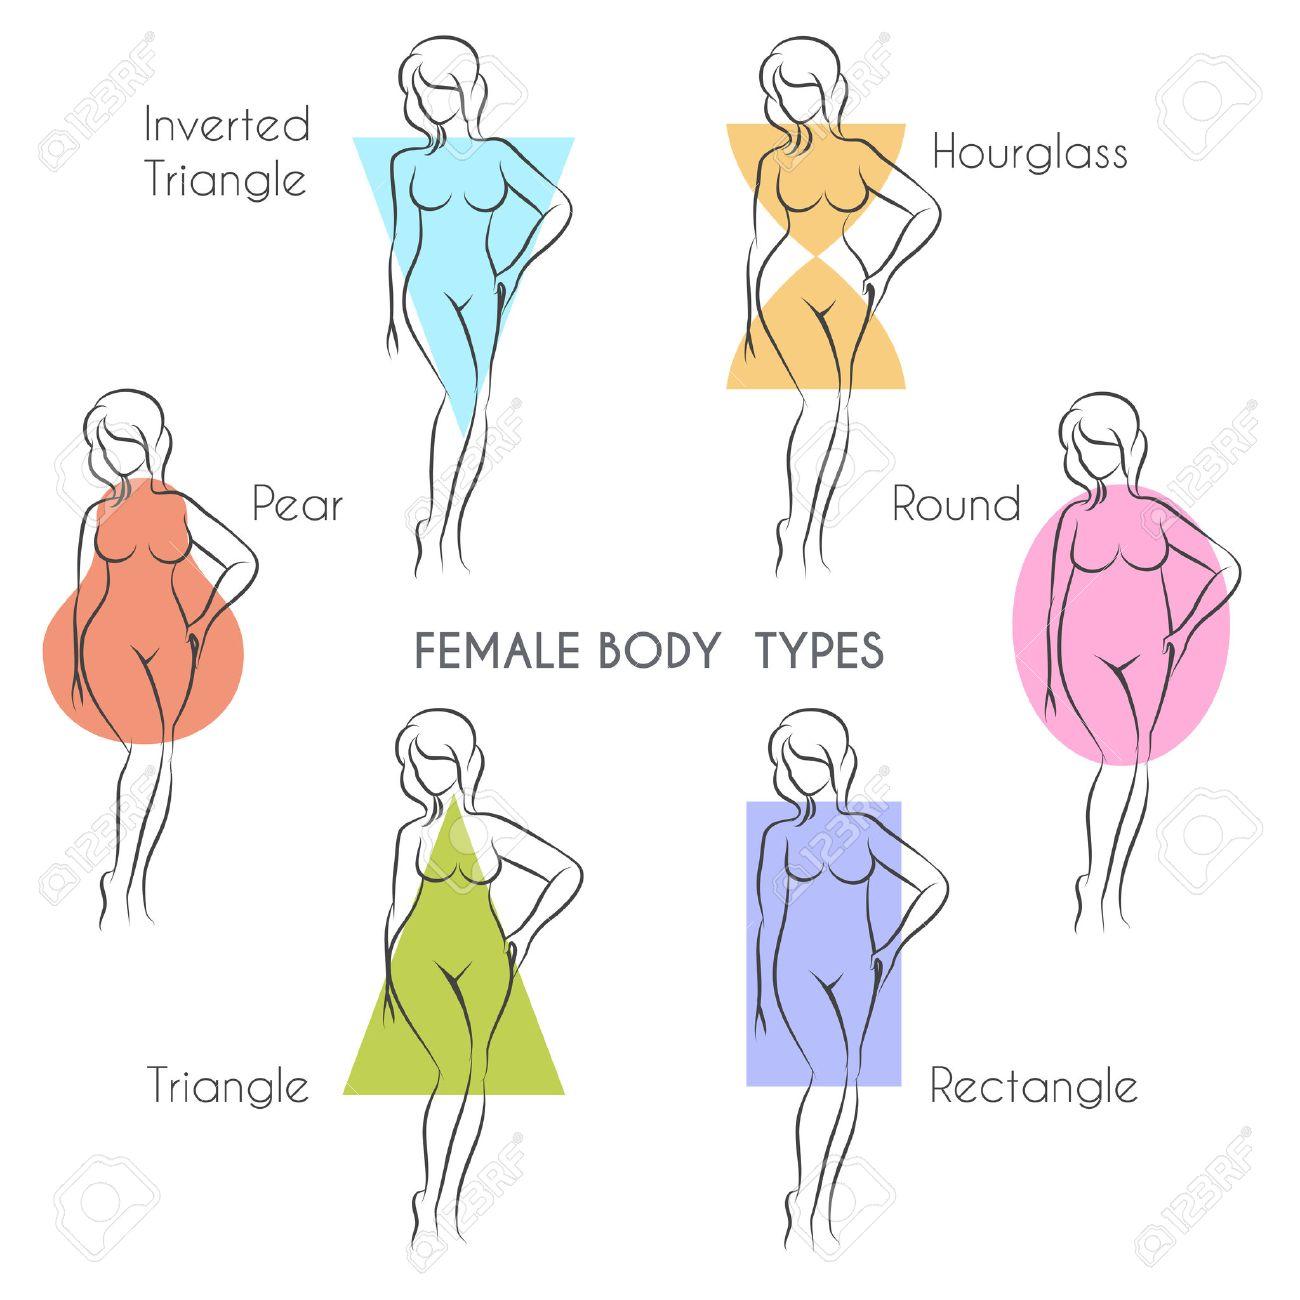 Female body types anatomy. Main woman figure shape, free font used. - 52521674